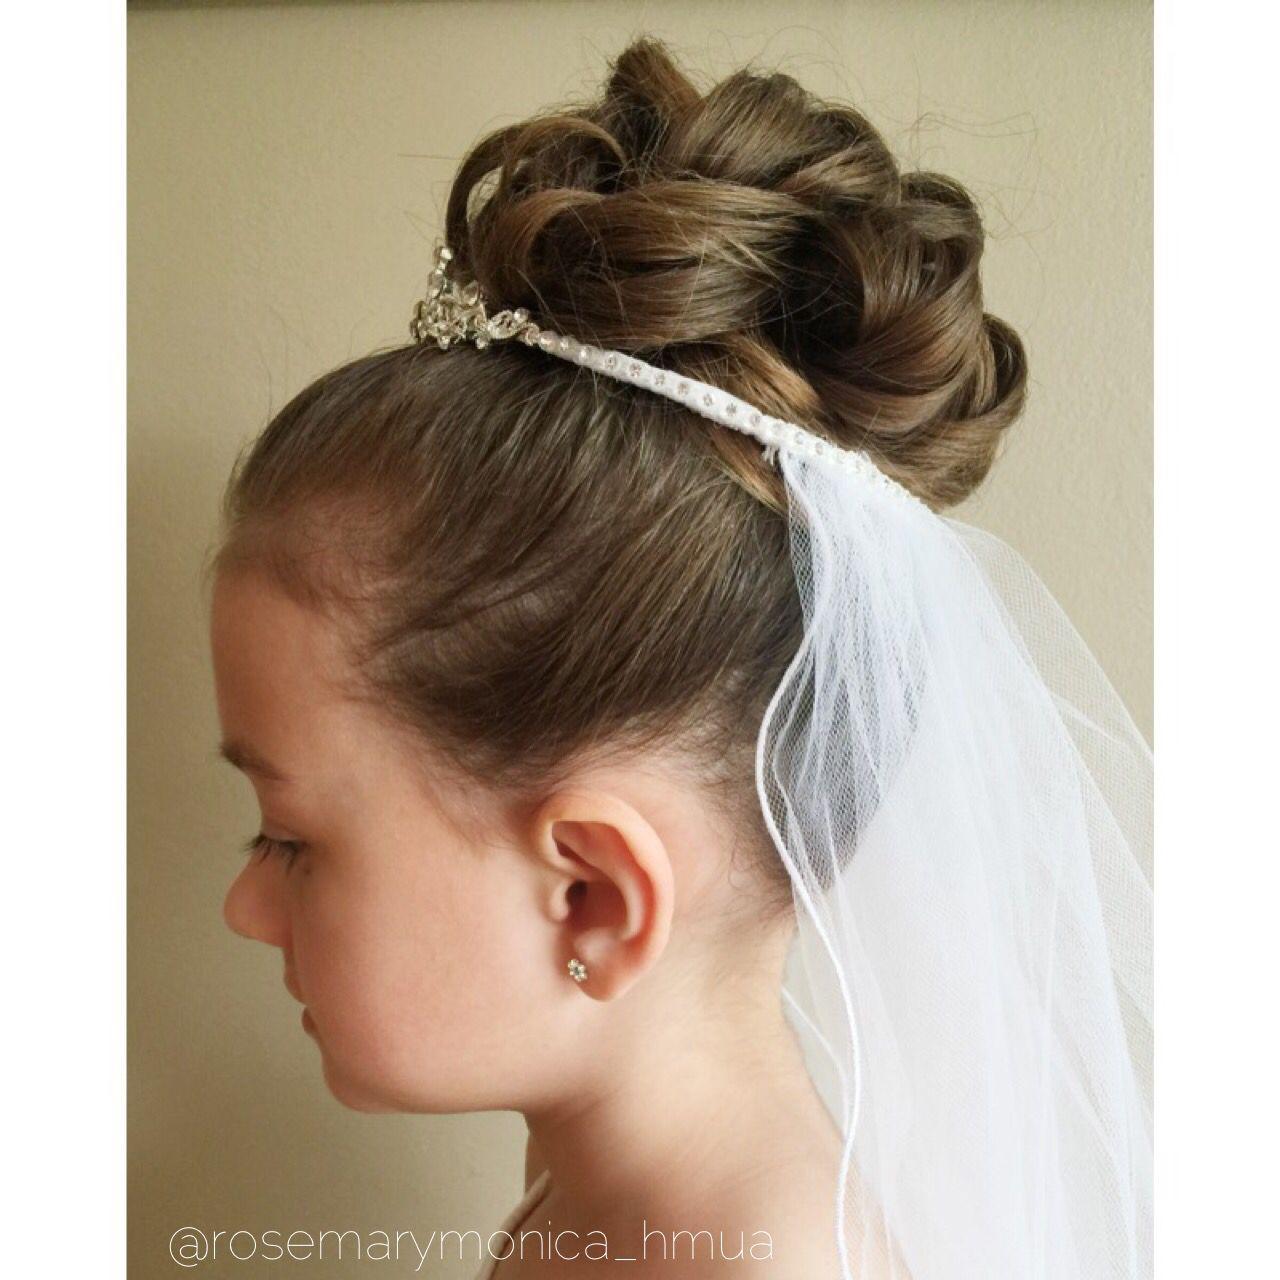 Bun Hairstyles For Communion